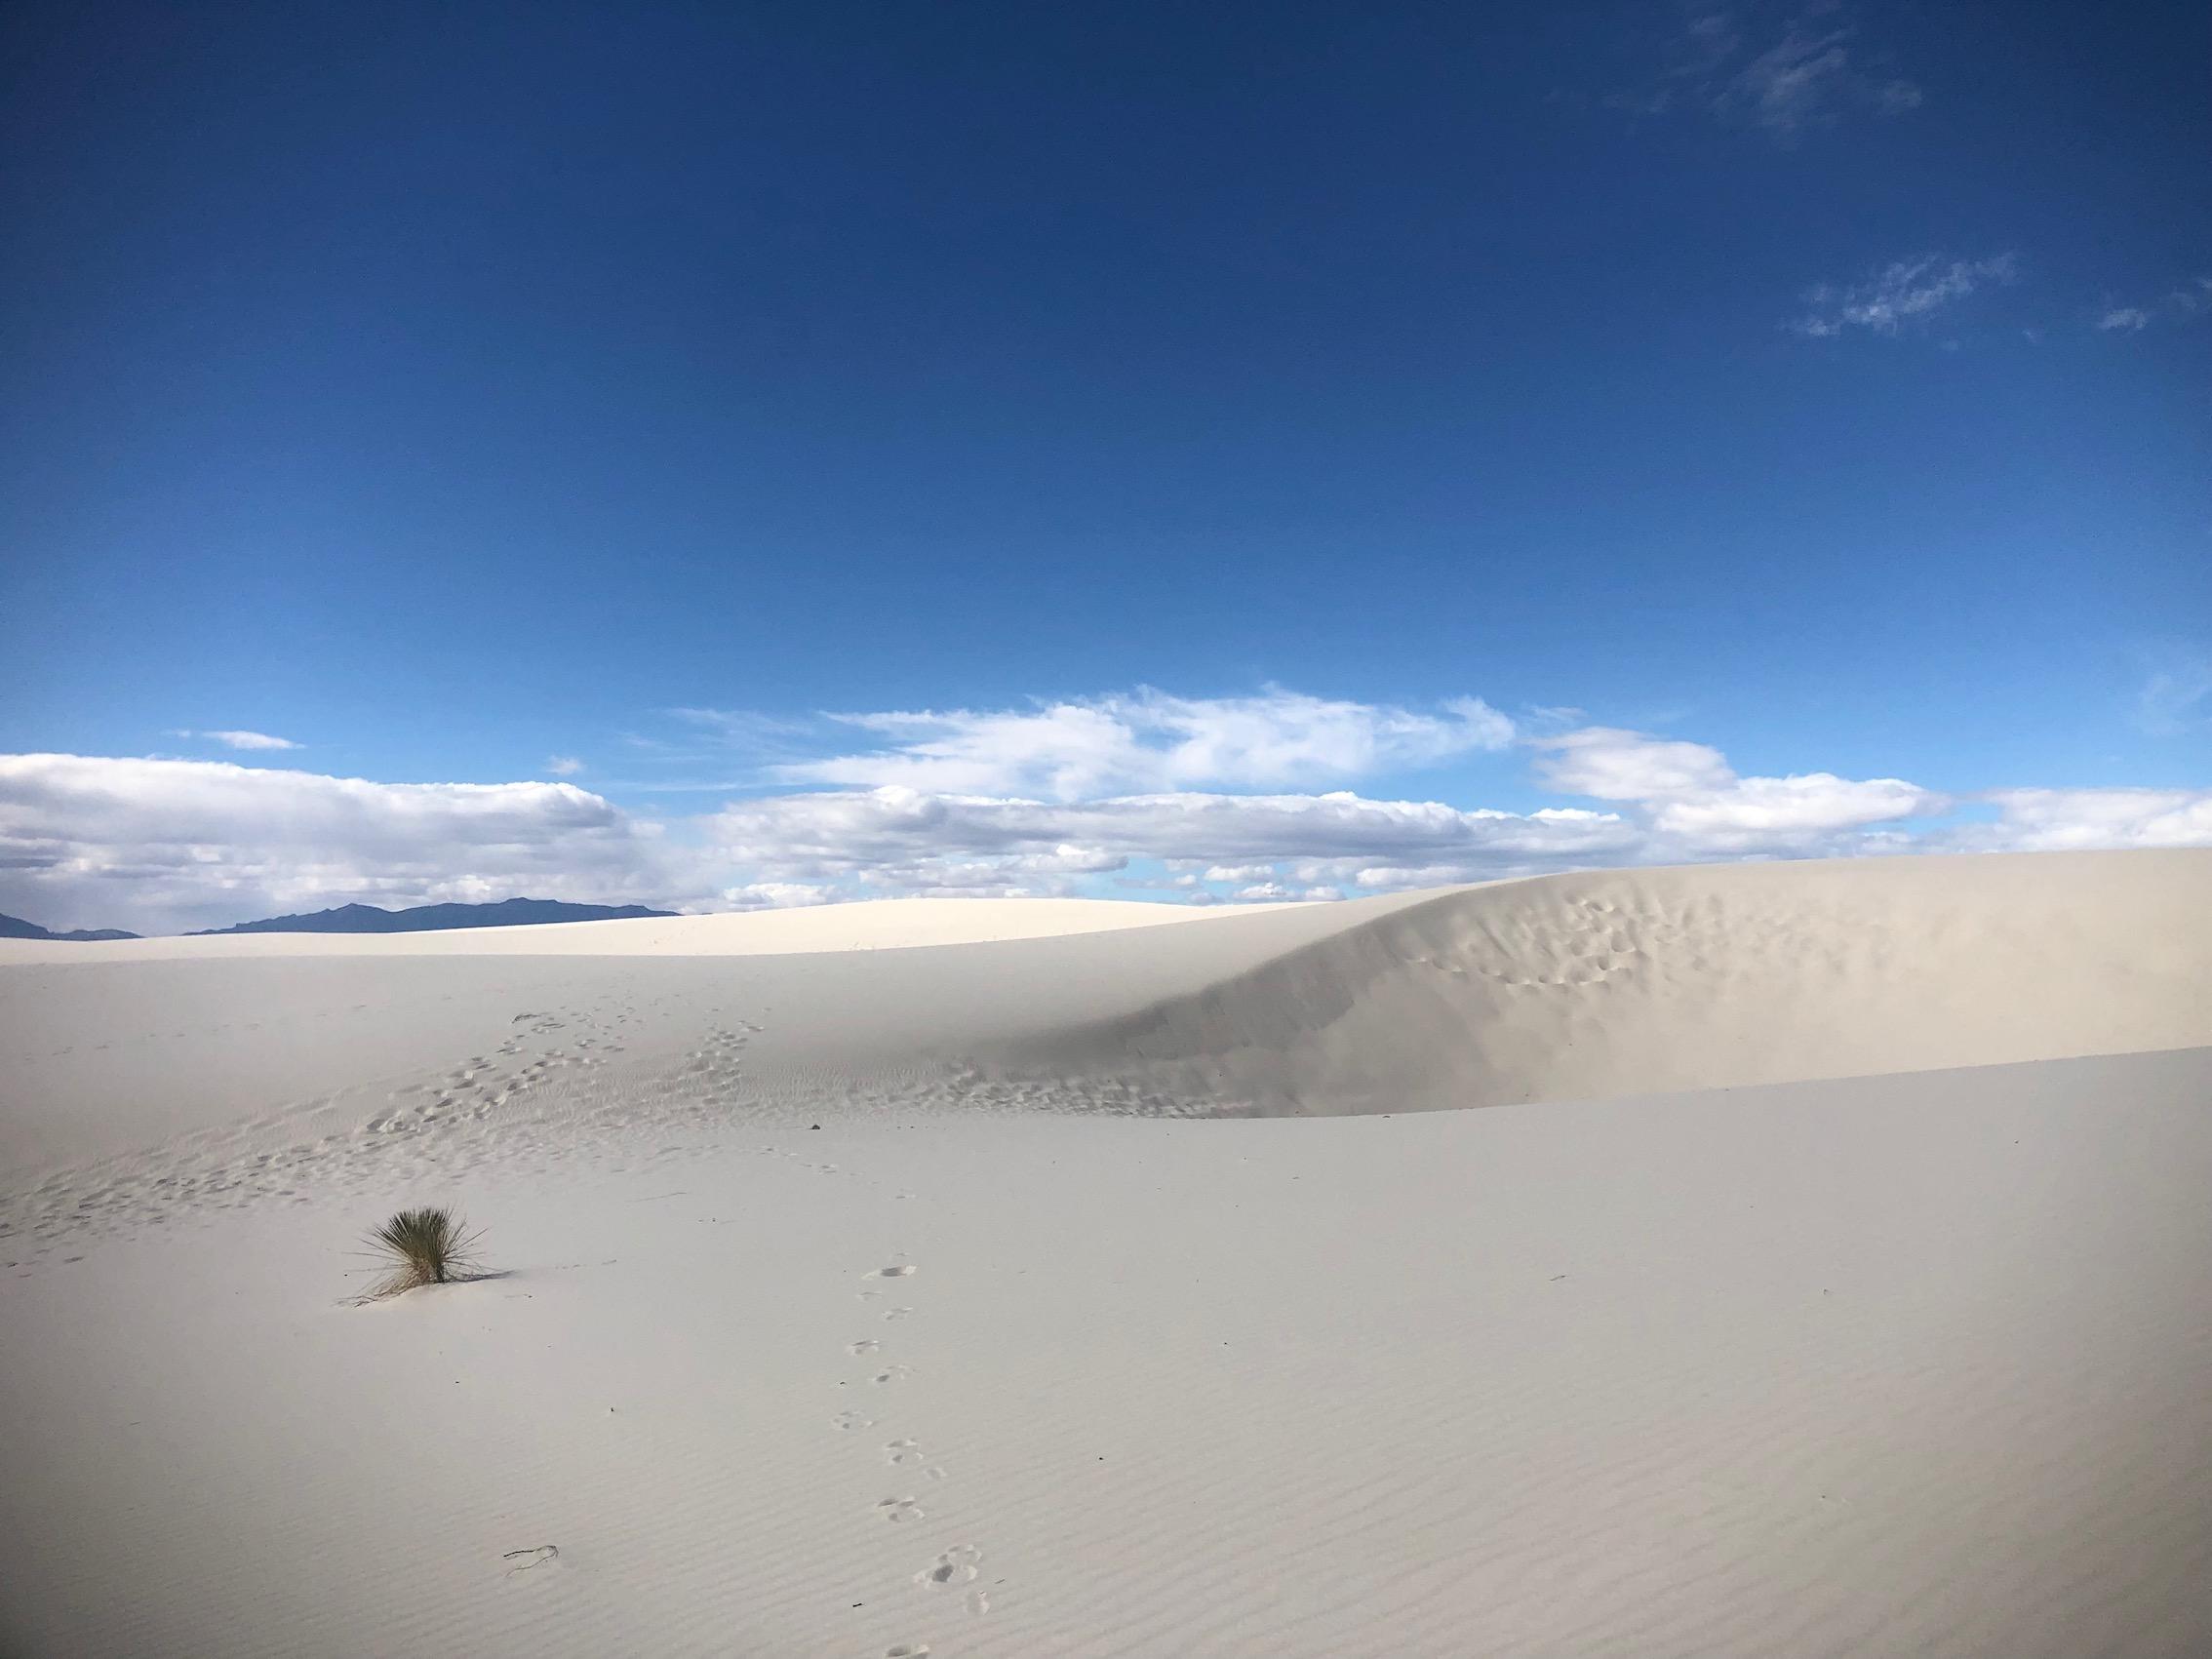 White Sands National Monument, NM, USA. Copyright Nadia Dominique, 2018.